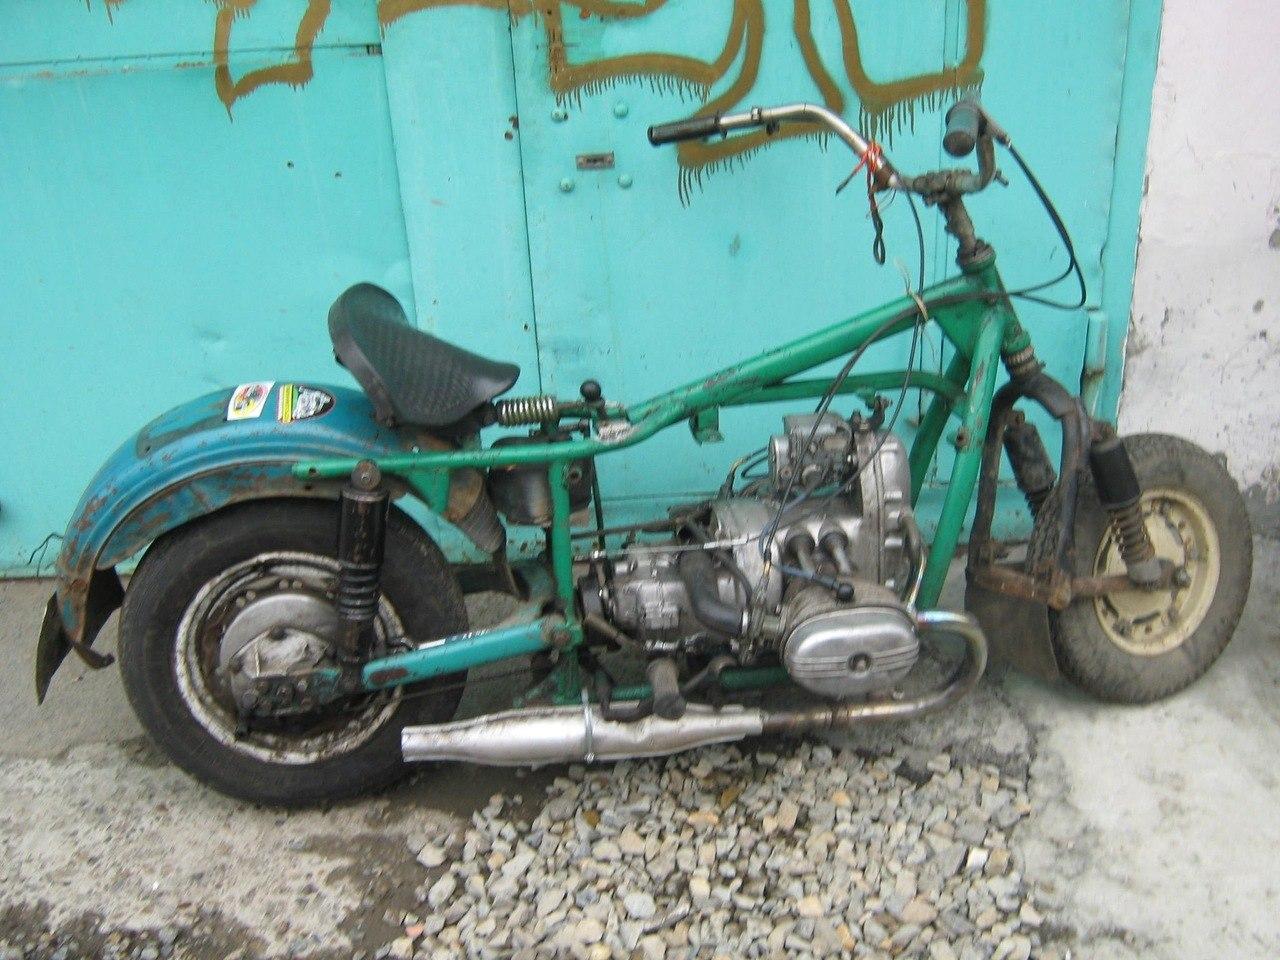 Moto032: Тюнинг мотоцикла минск 65